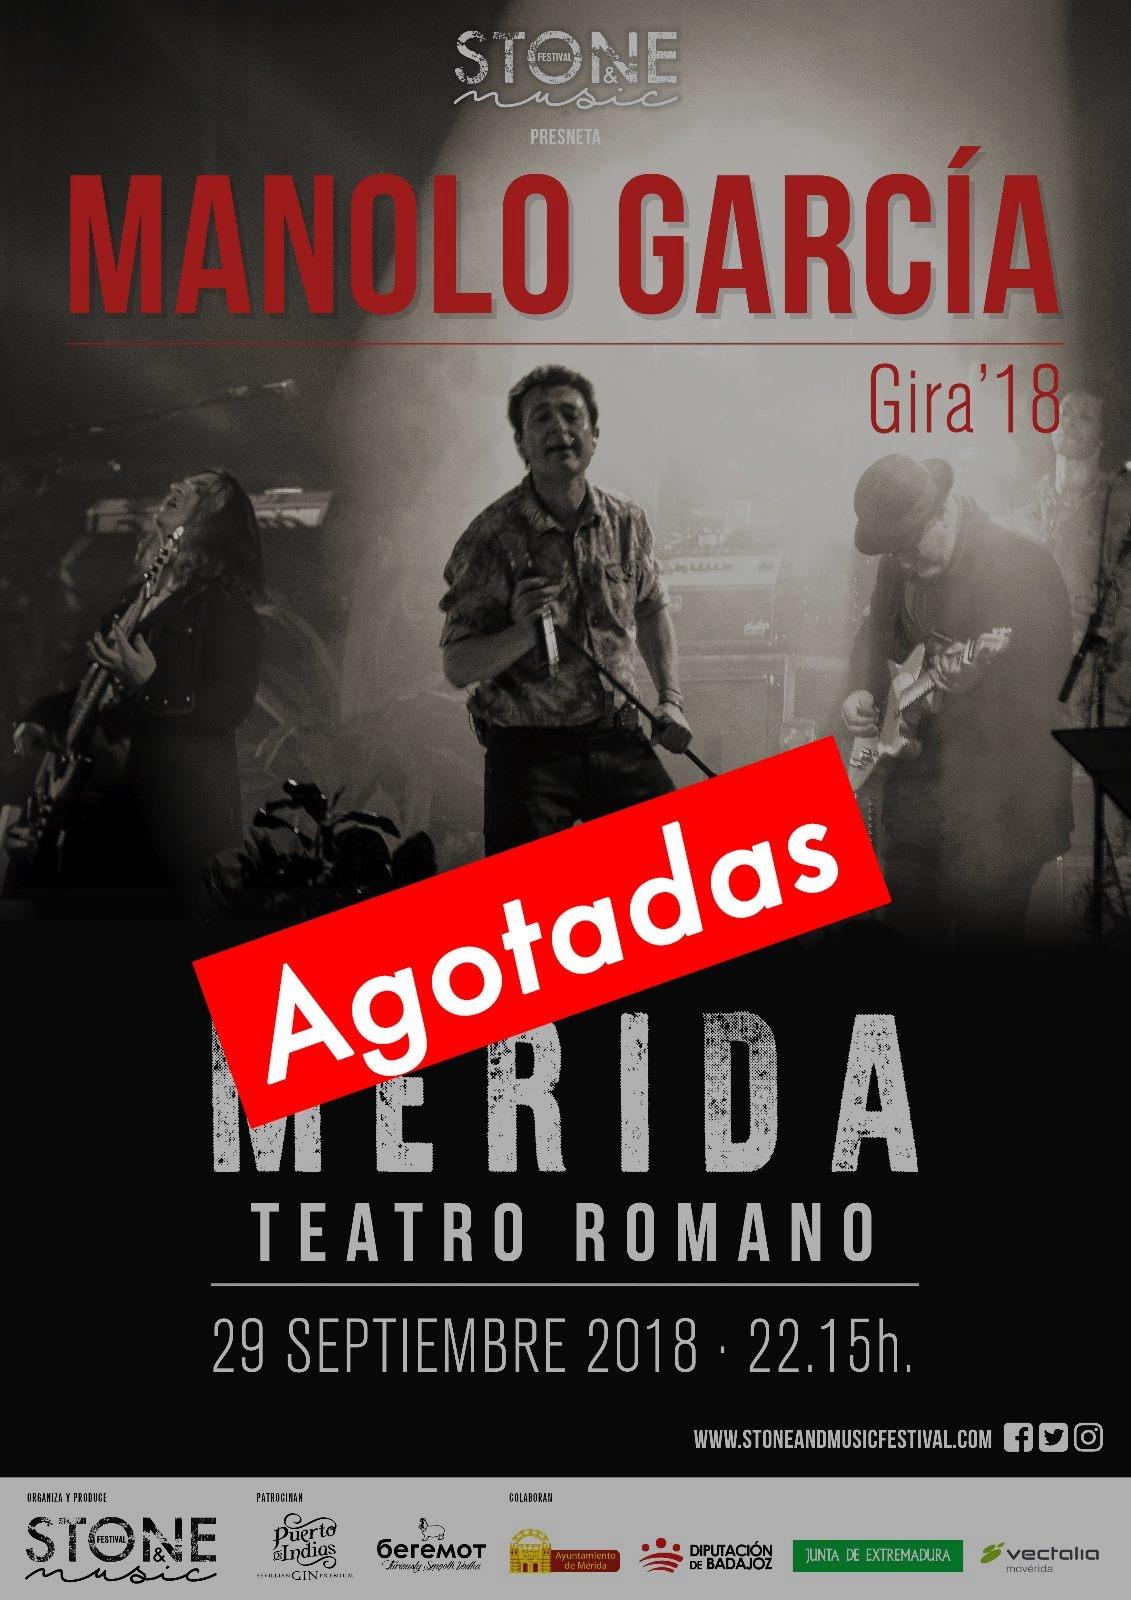 Manolo García 29.09 Stone & Music Festival